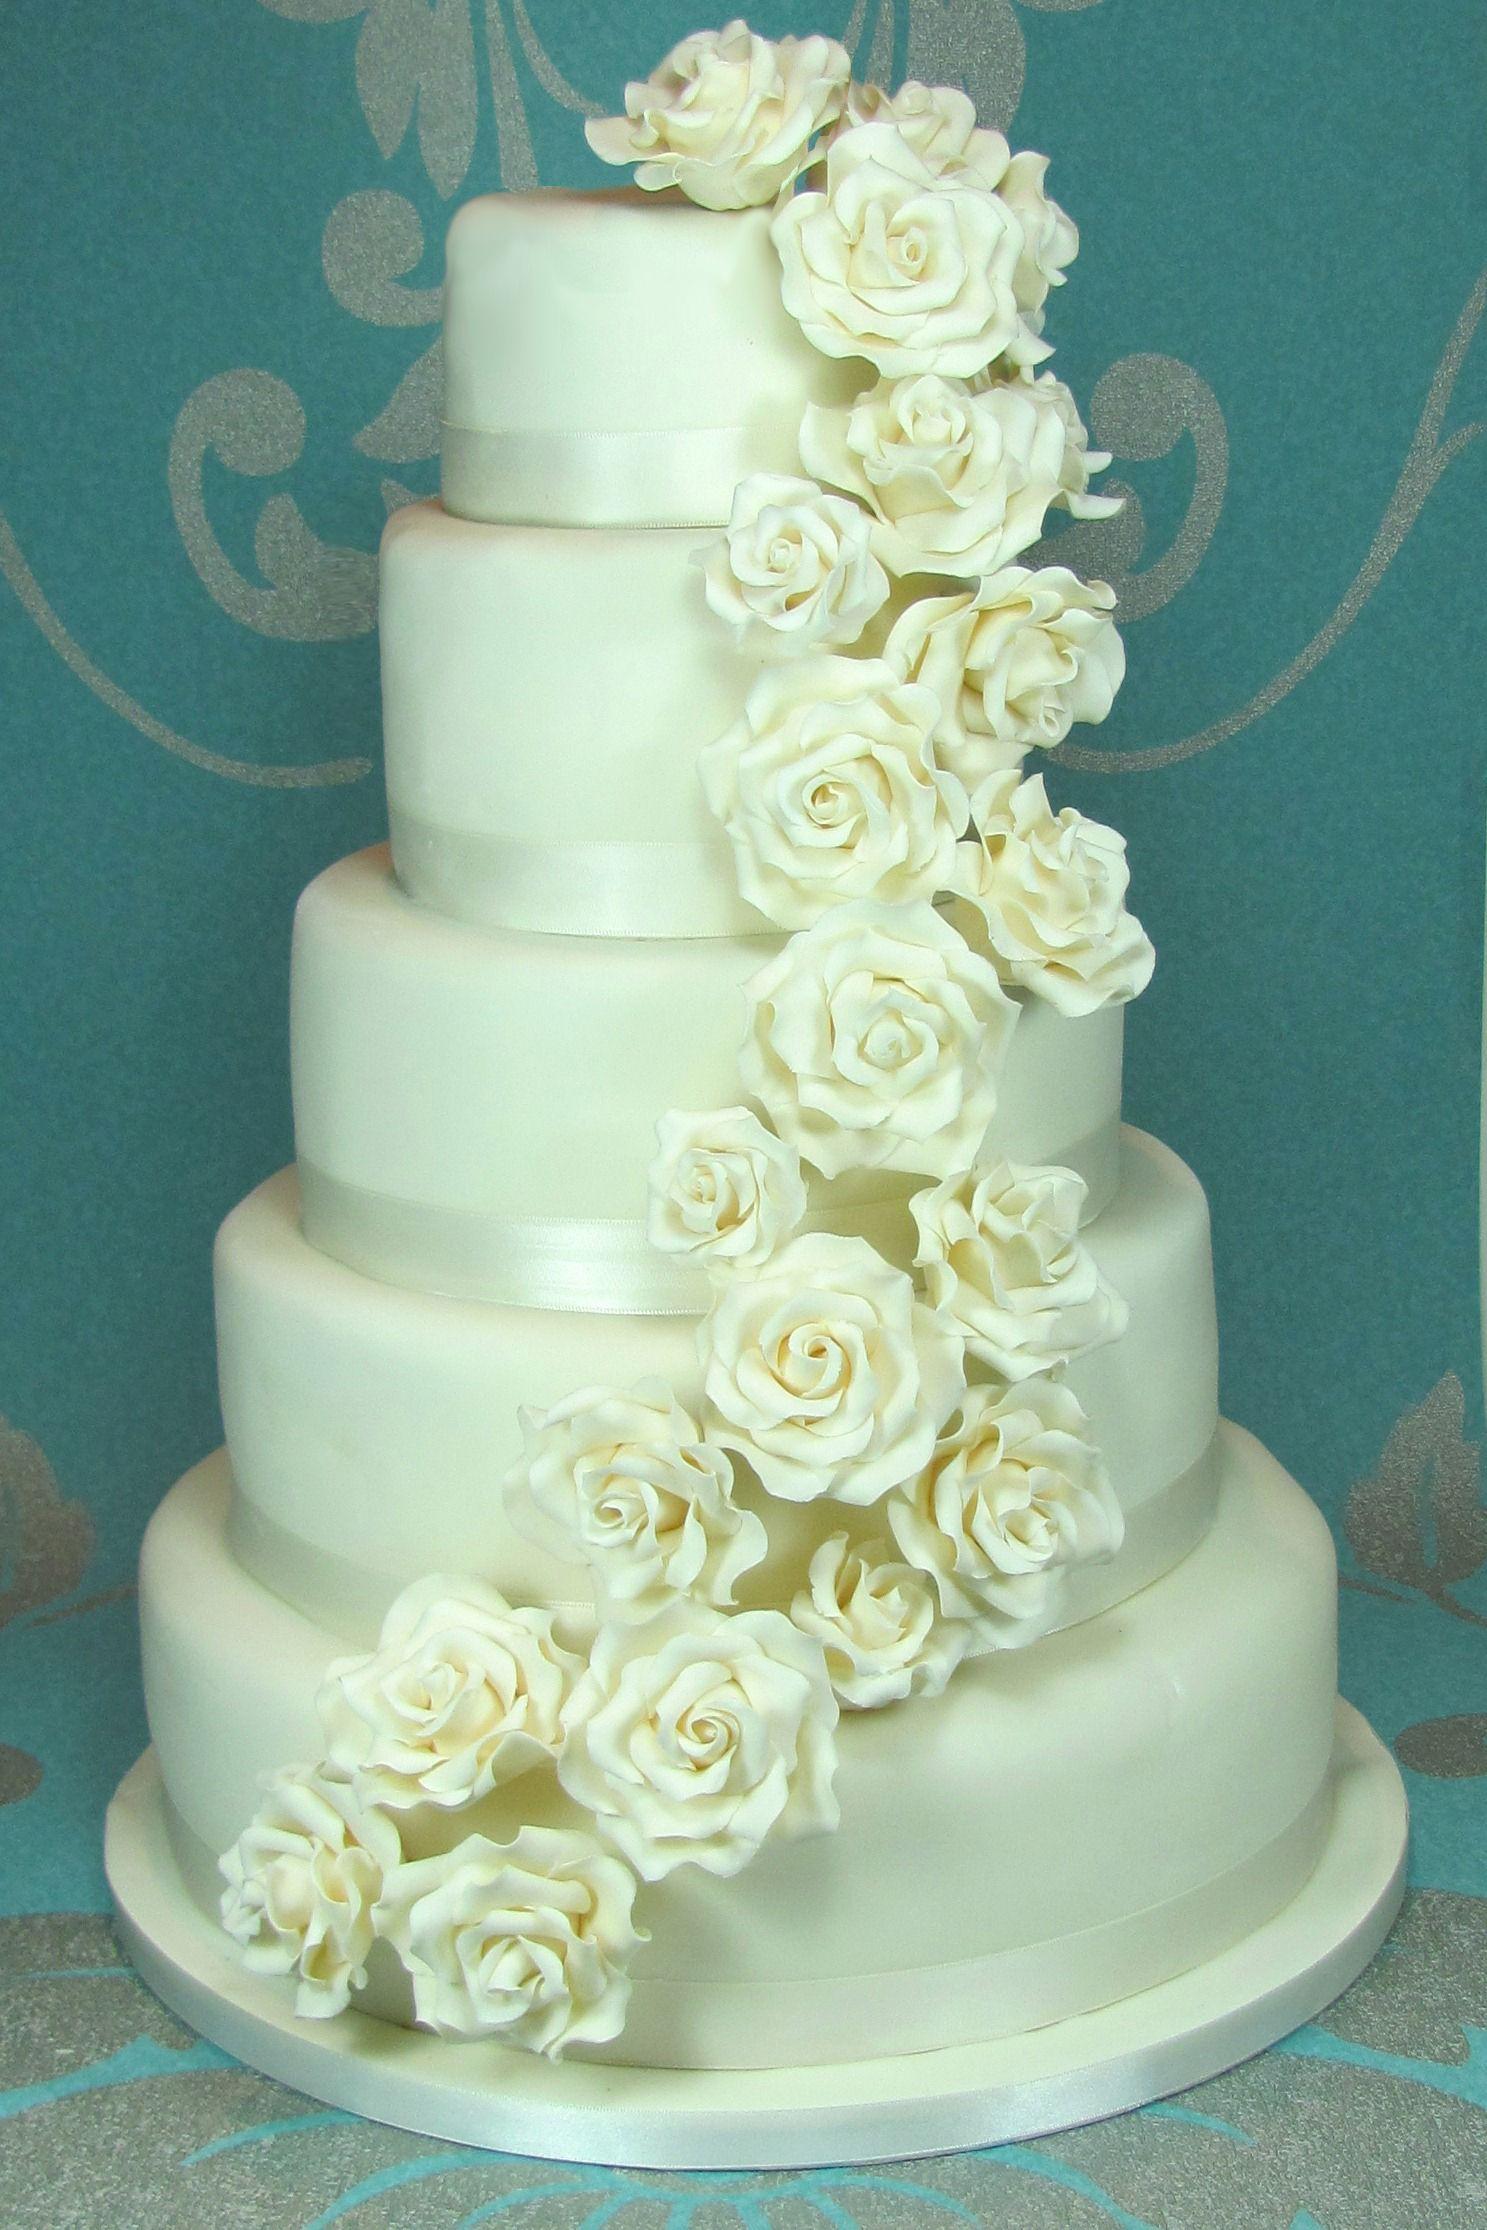 Wedding Cake Flowers February Flowery Cakes